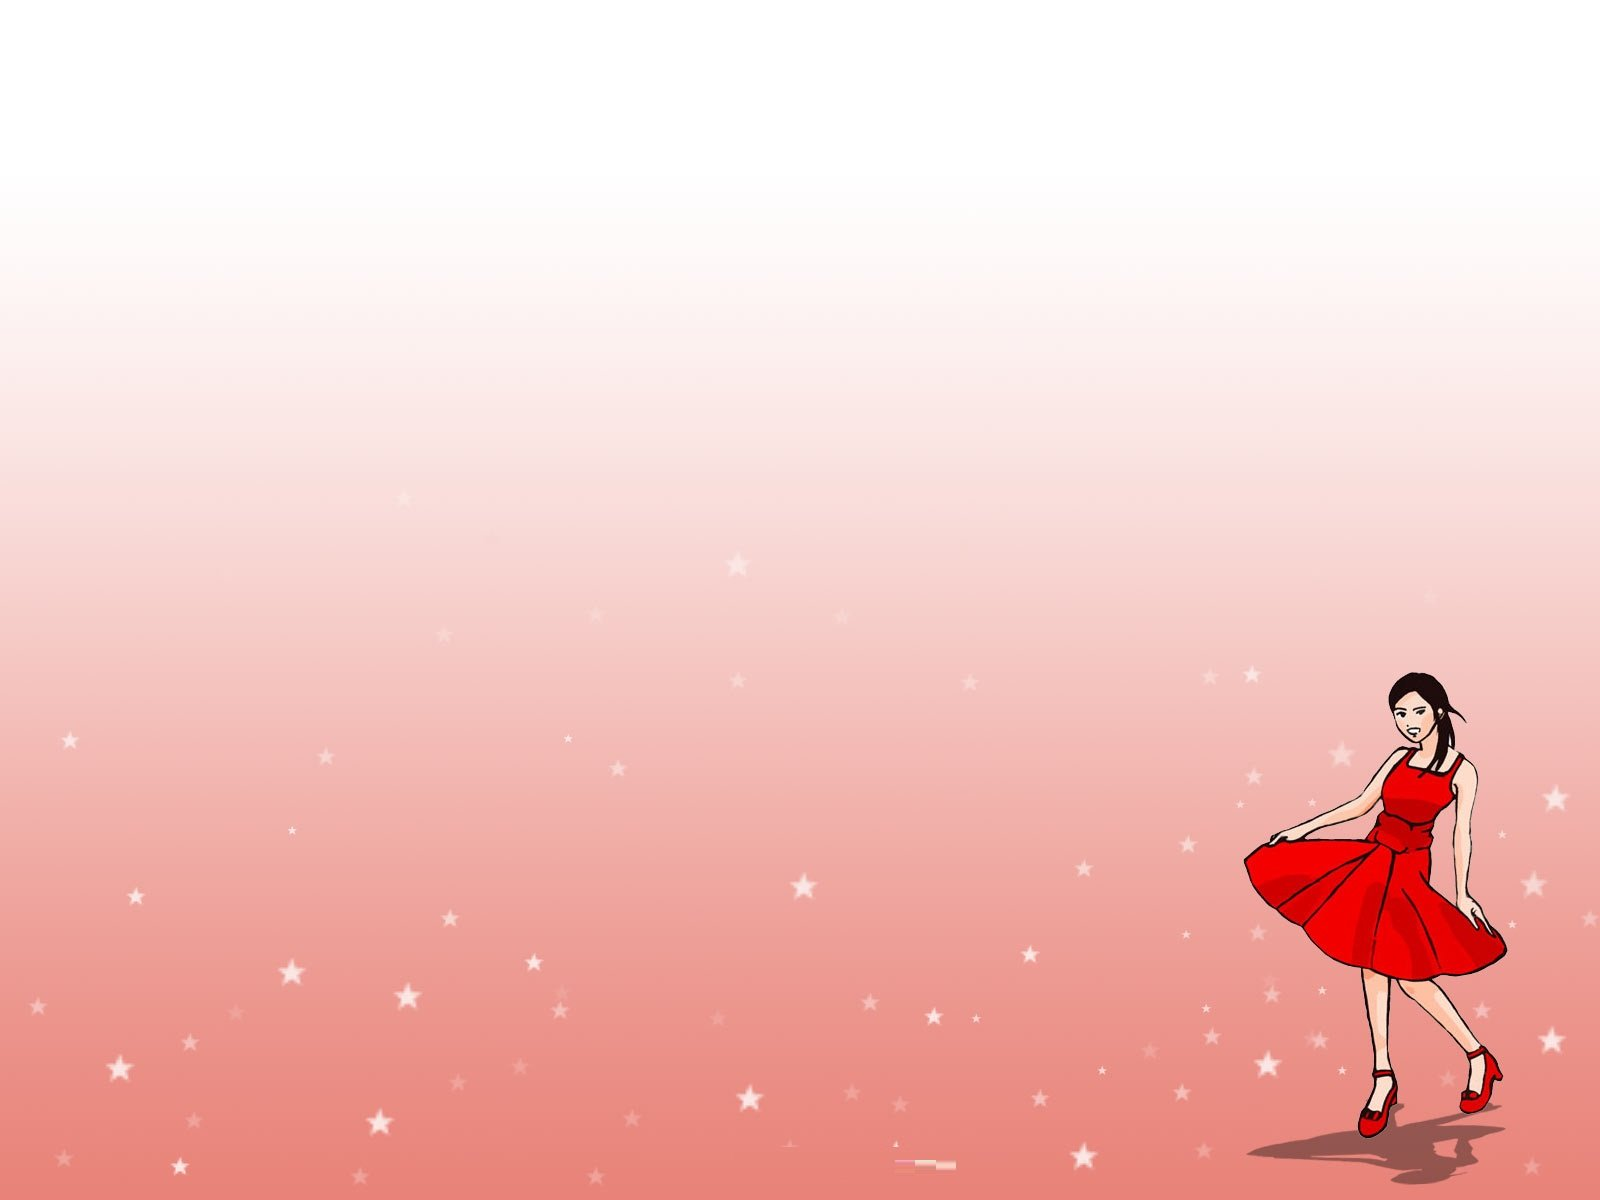 Free Download Cute Ballet Dancing Backgrounds For Desktop 15017 Wallpaper 1600x1200 For Your Desktop Mobile Tablet Explore 45 Cute Dance Wallpaper Cute Wallpapers For Laptops Cute Wallpapers For Girls Cute Wallpapers Tumblr